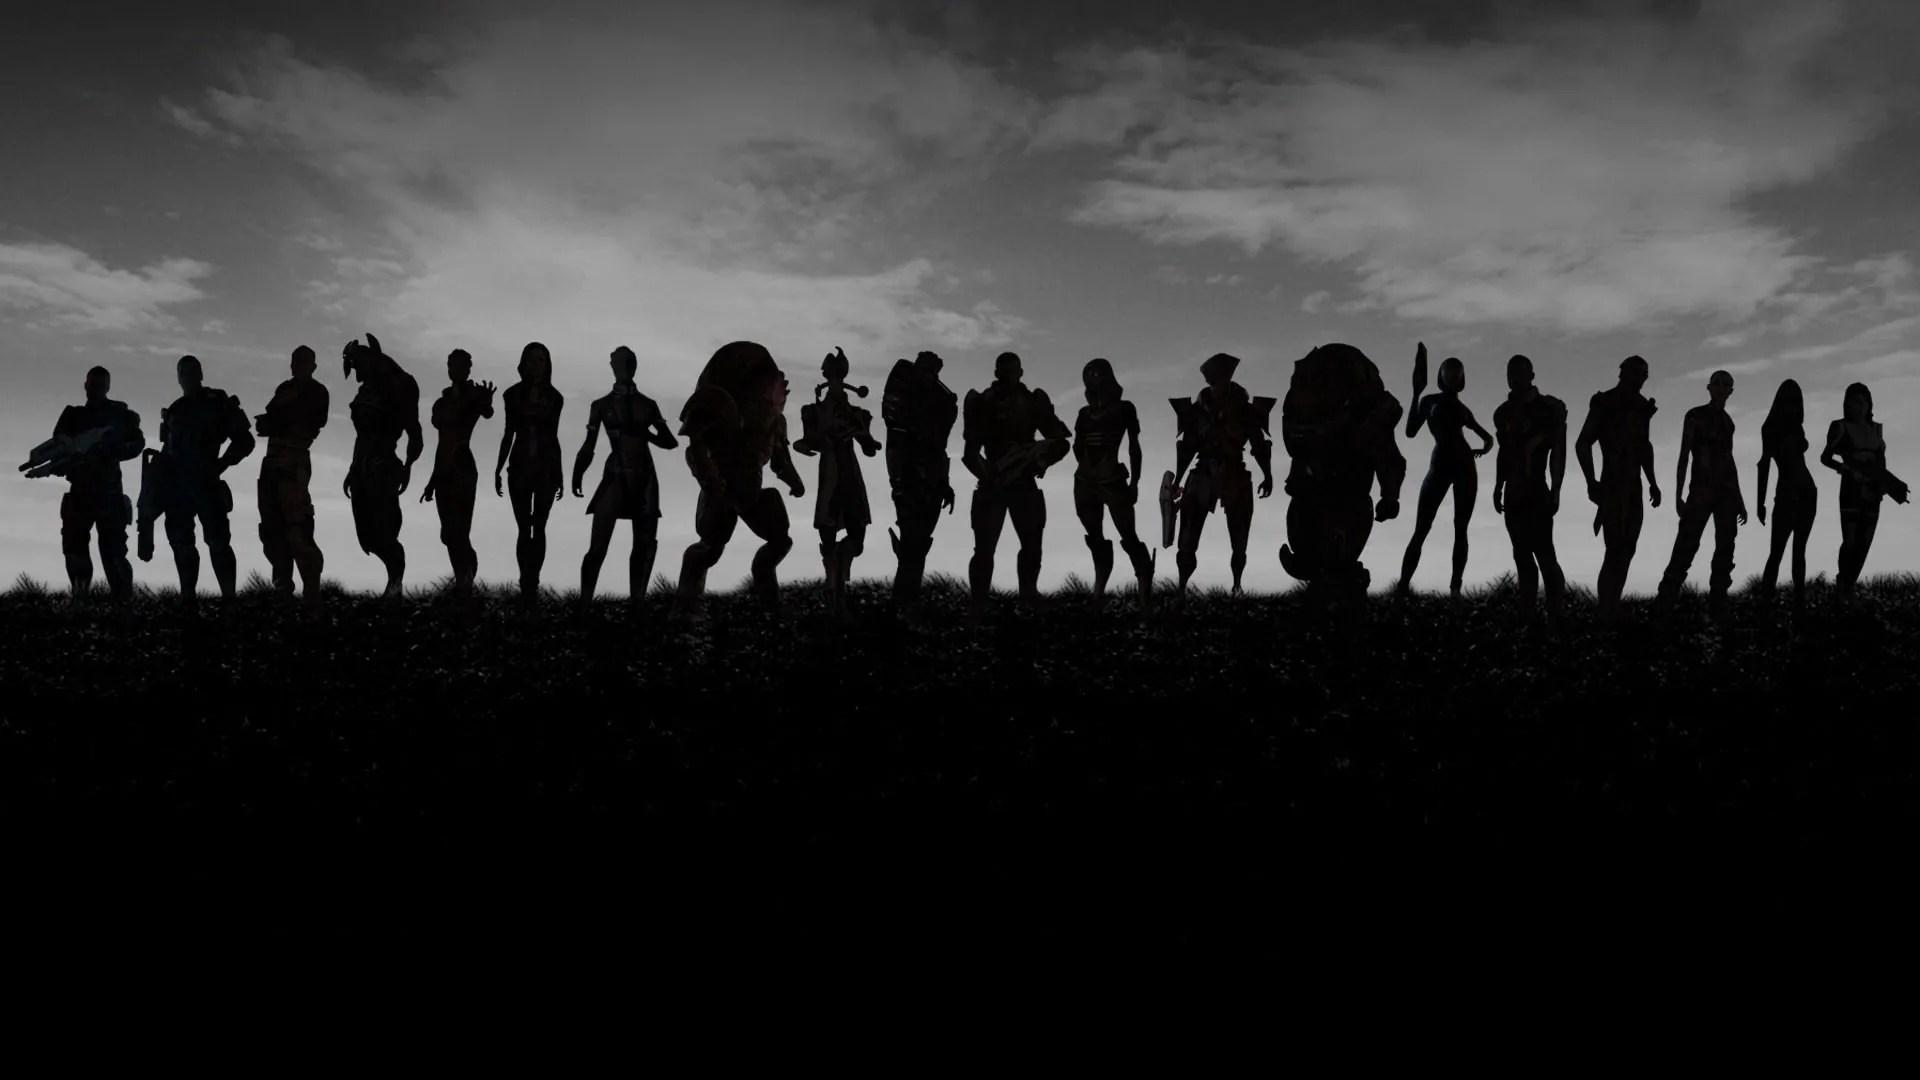 Fighters Black Wallpaper